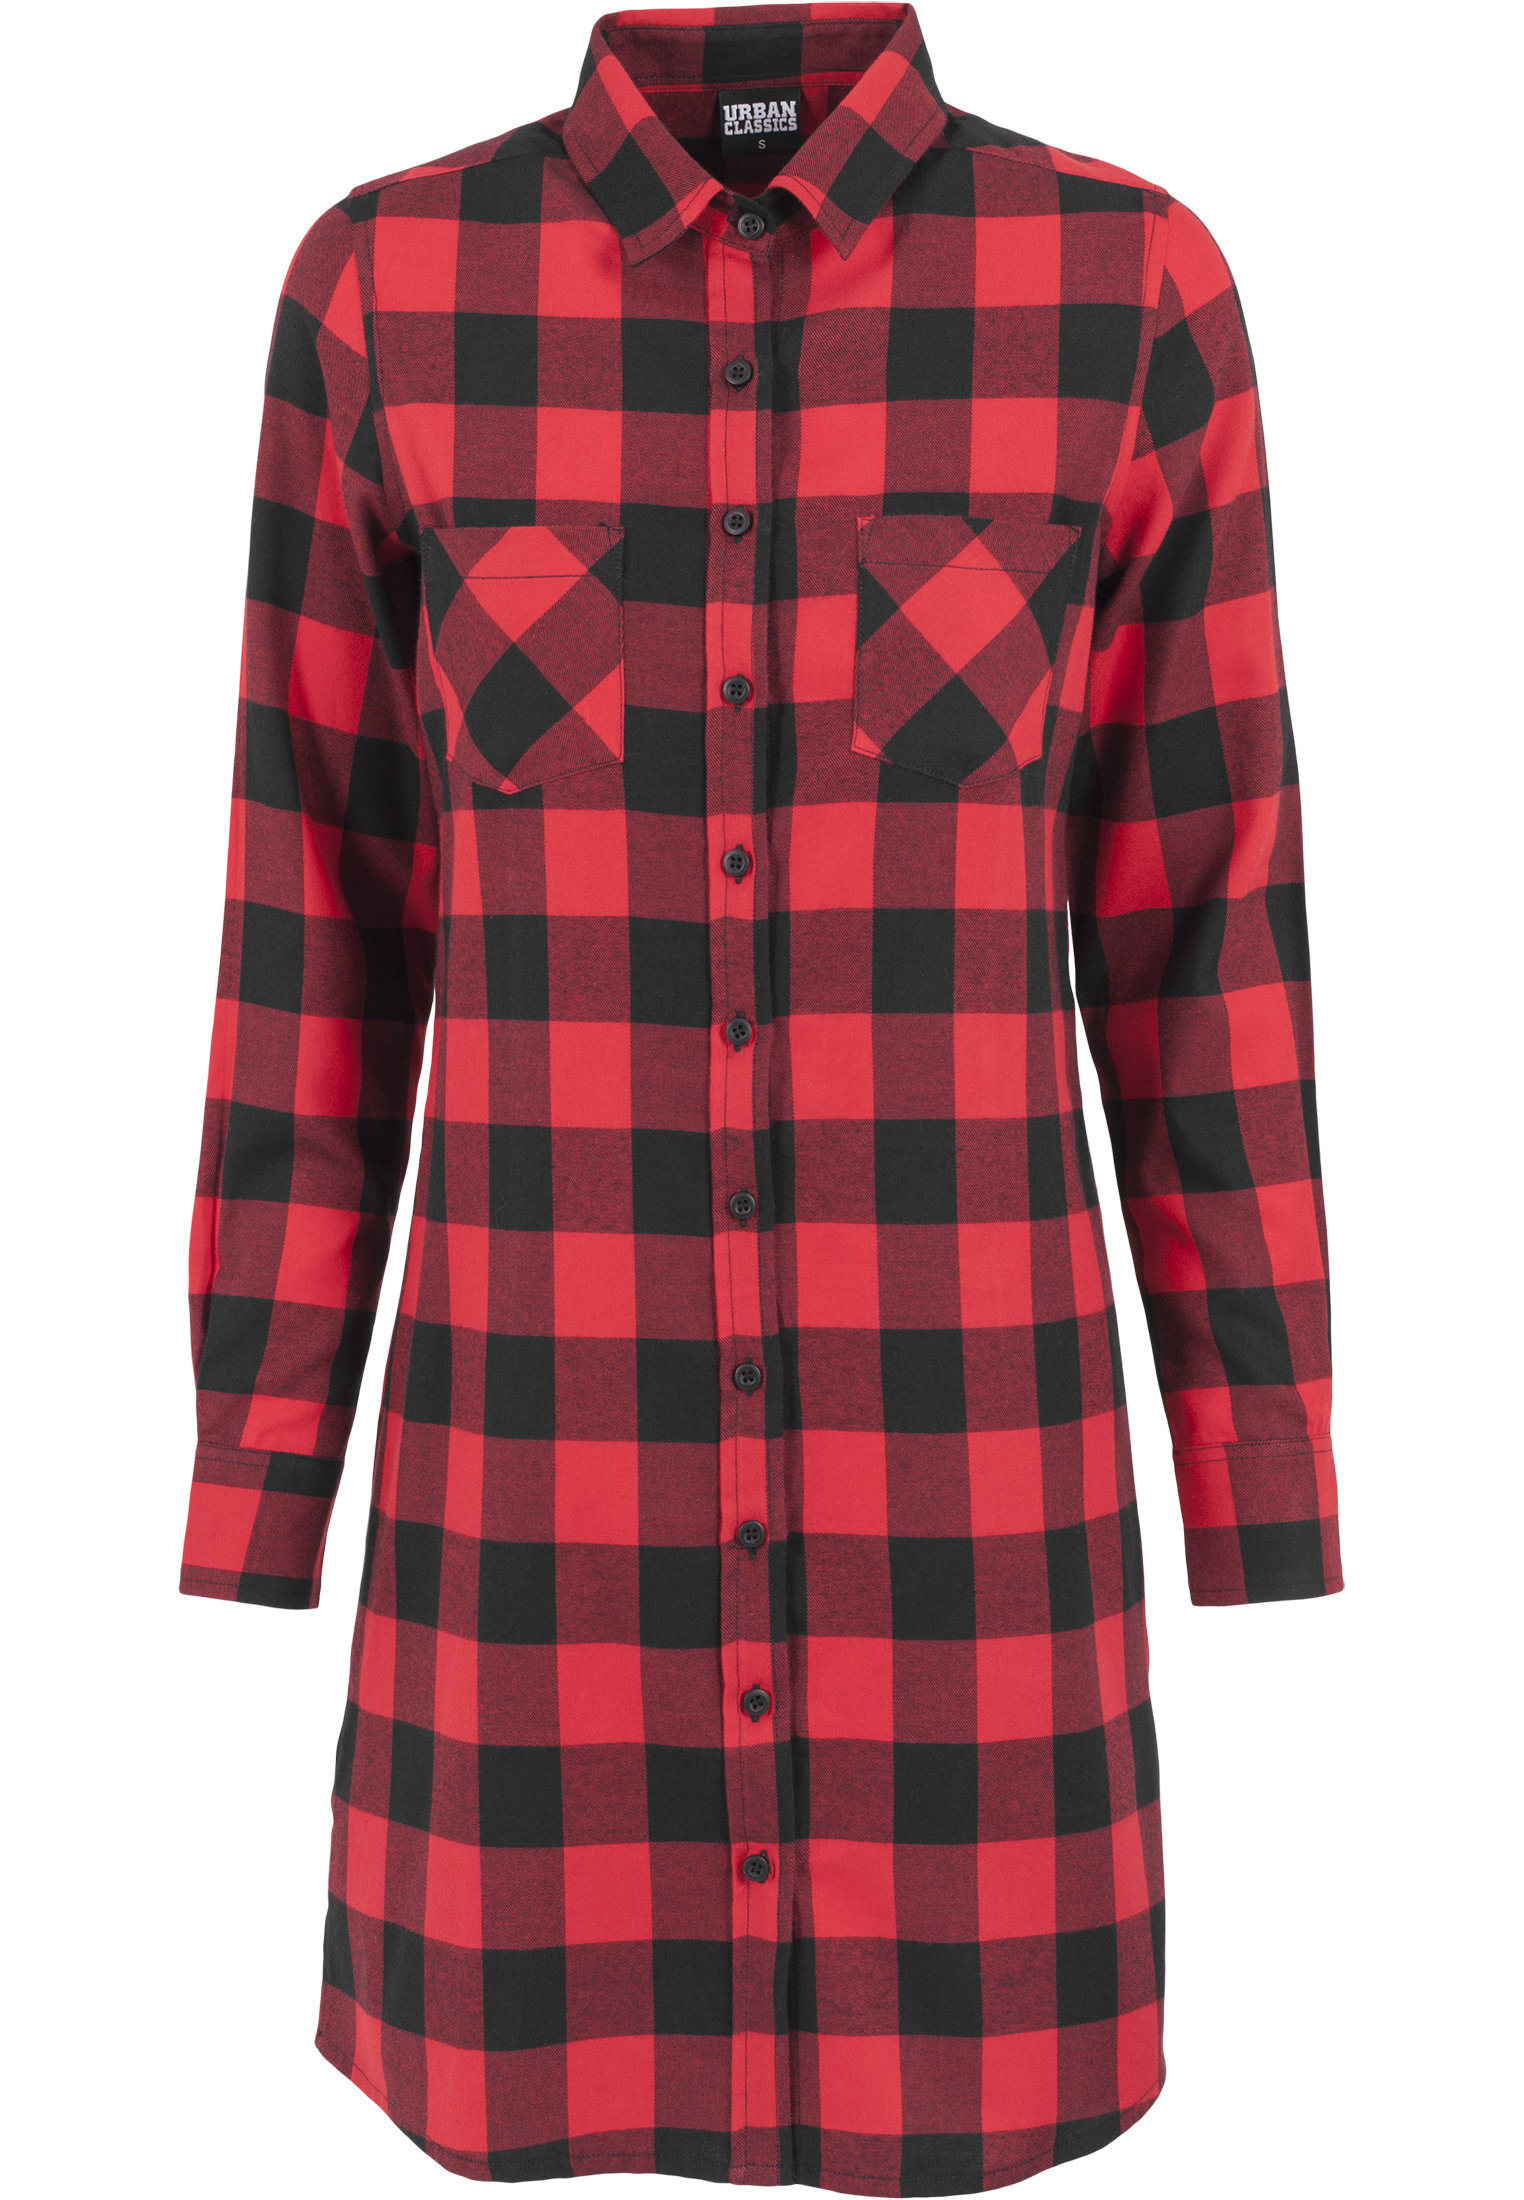 Robe chemise à carreaux URBAN CLASSICS rouge et noire urban classics-robe checked flanell rouge